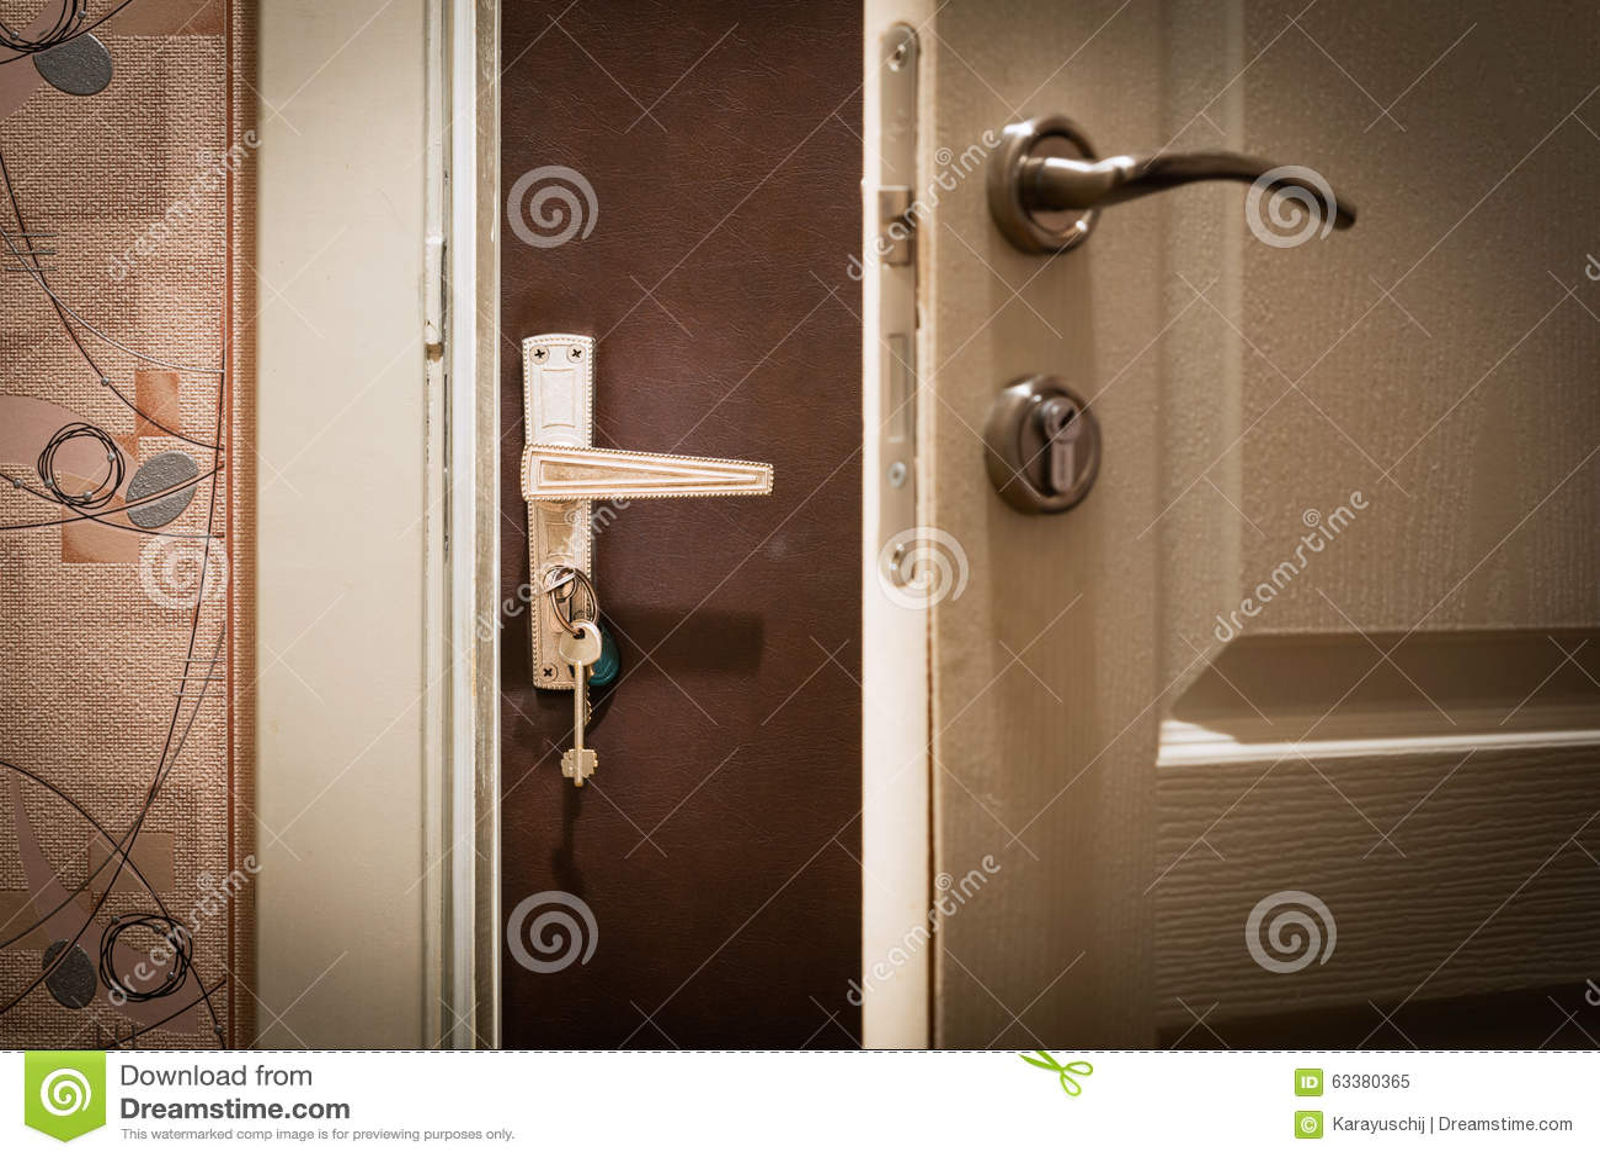 Double Door At Home Stock Photo Image 63380365